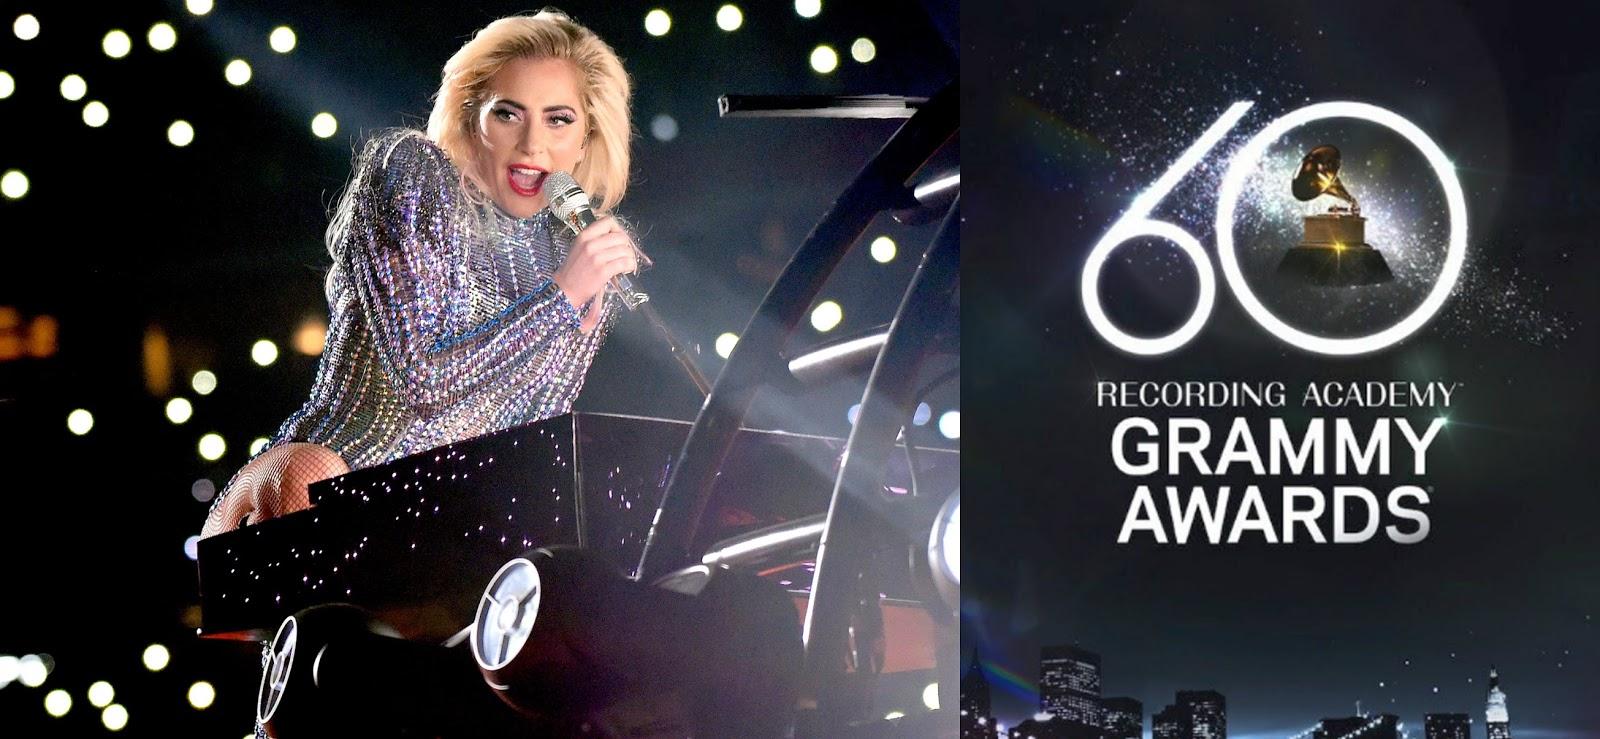 lady+gaga+grammys+2018+performance.jpg